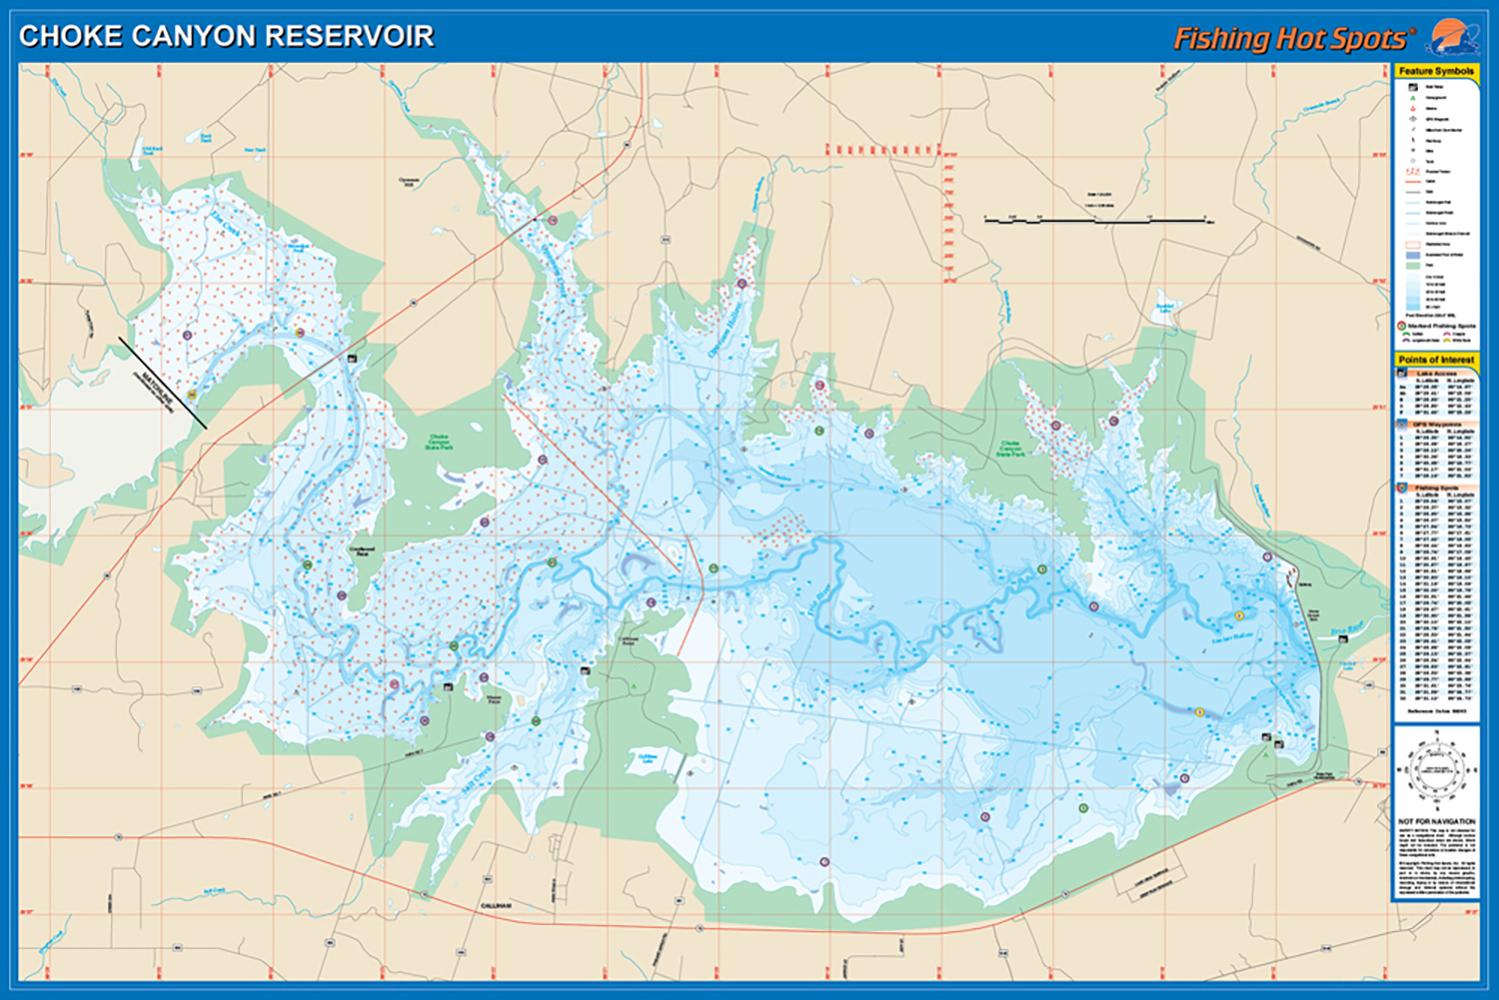 Choke Canyon Reservoir Fishing Map - Texas Lake Maps Fishing